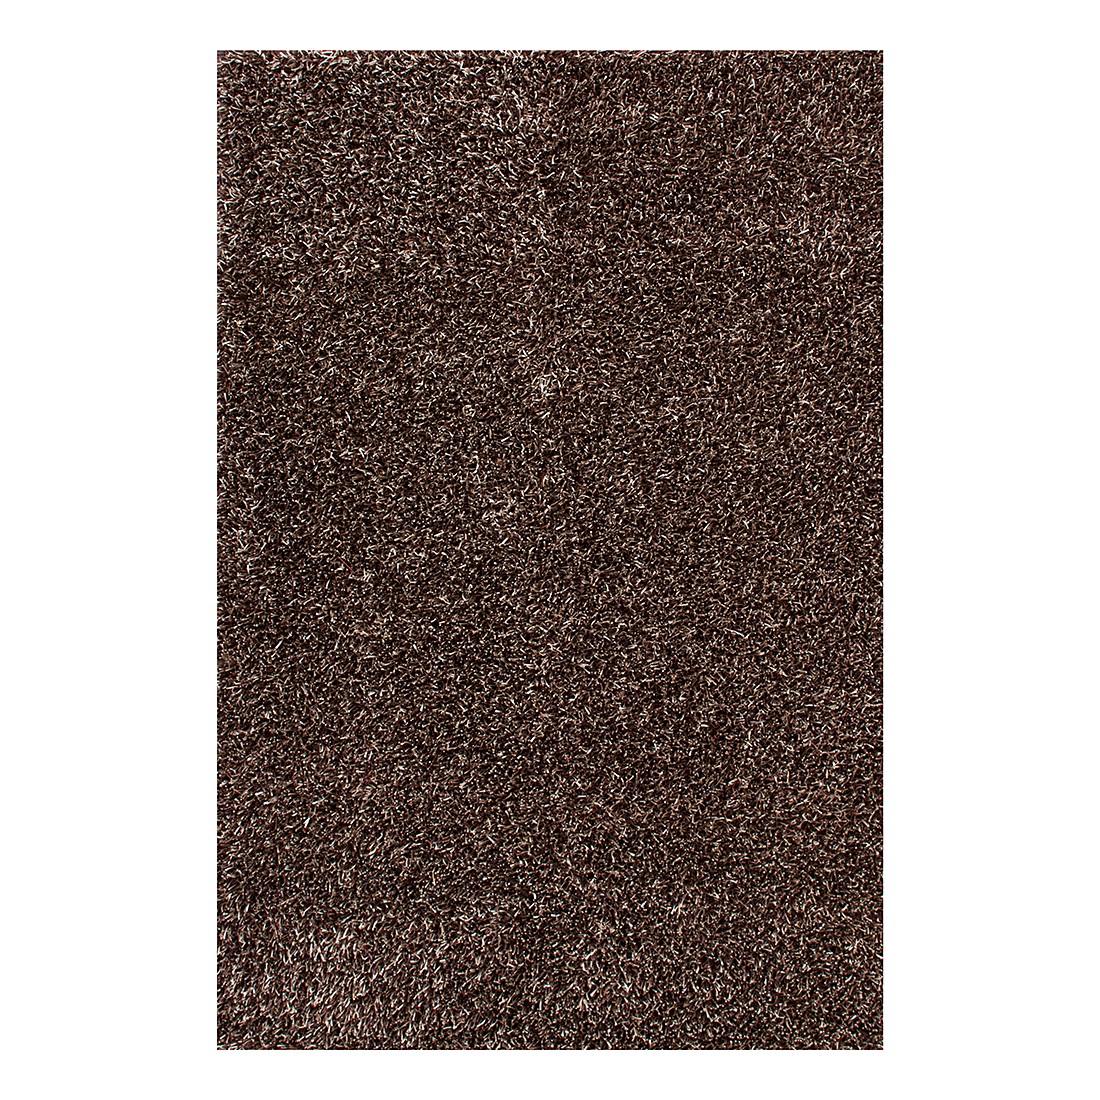 Teppich Flamenco – Braun – 80 x 150 cm, Kayoom online kaufen